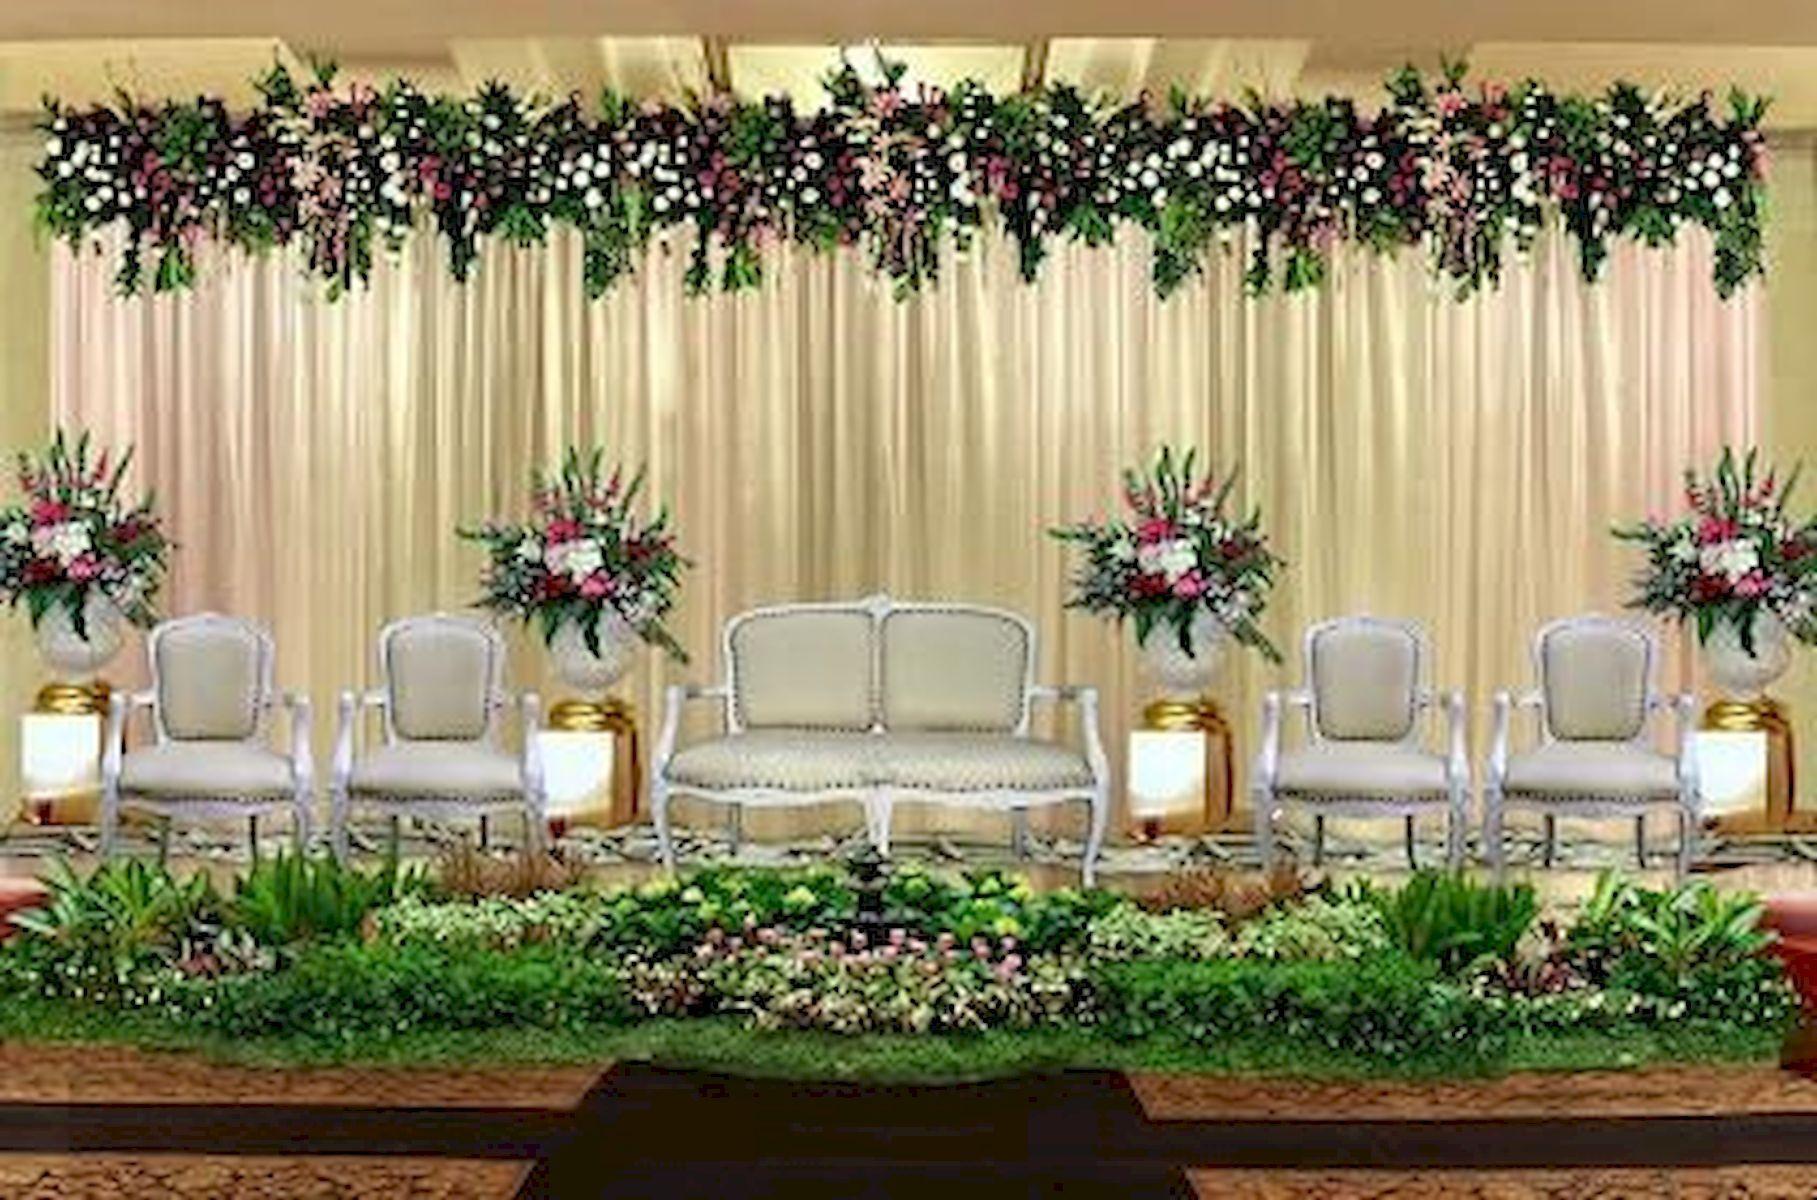 Outdoor Wedding Decoration Ideas Jihanshanum Party Ideas Outdoor Wedding Decorations Wedding Backdrop Design Wedding Decorations